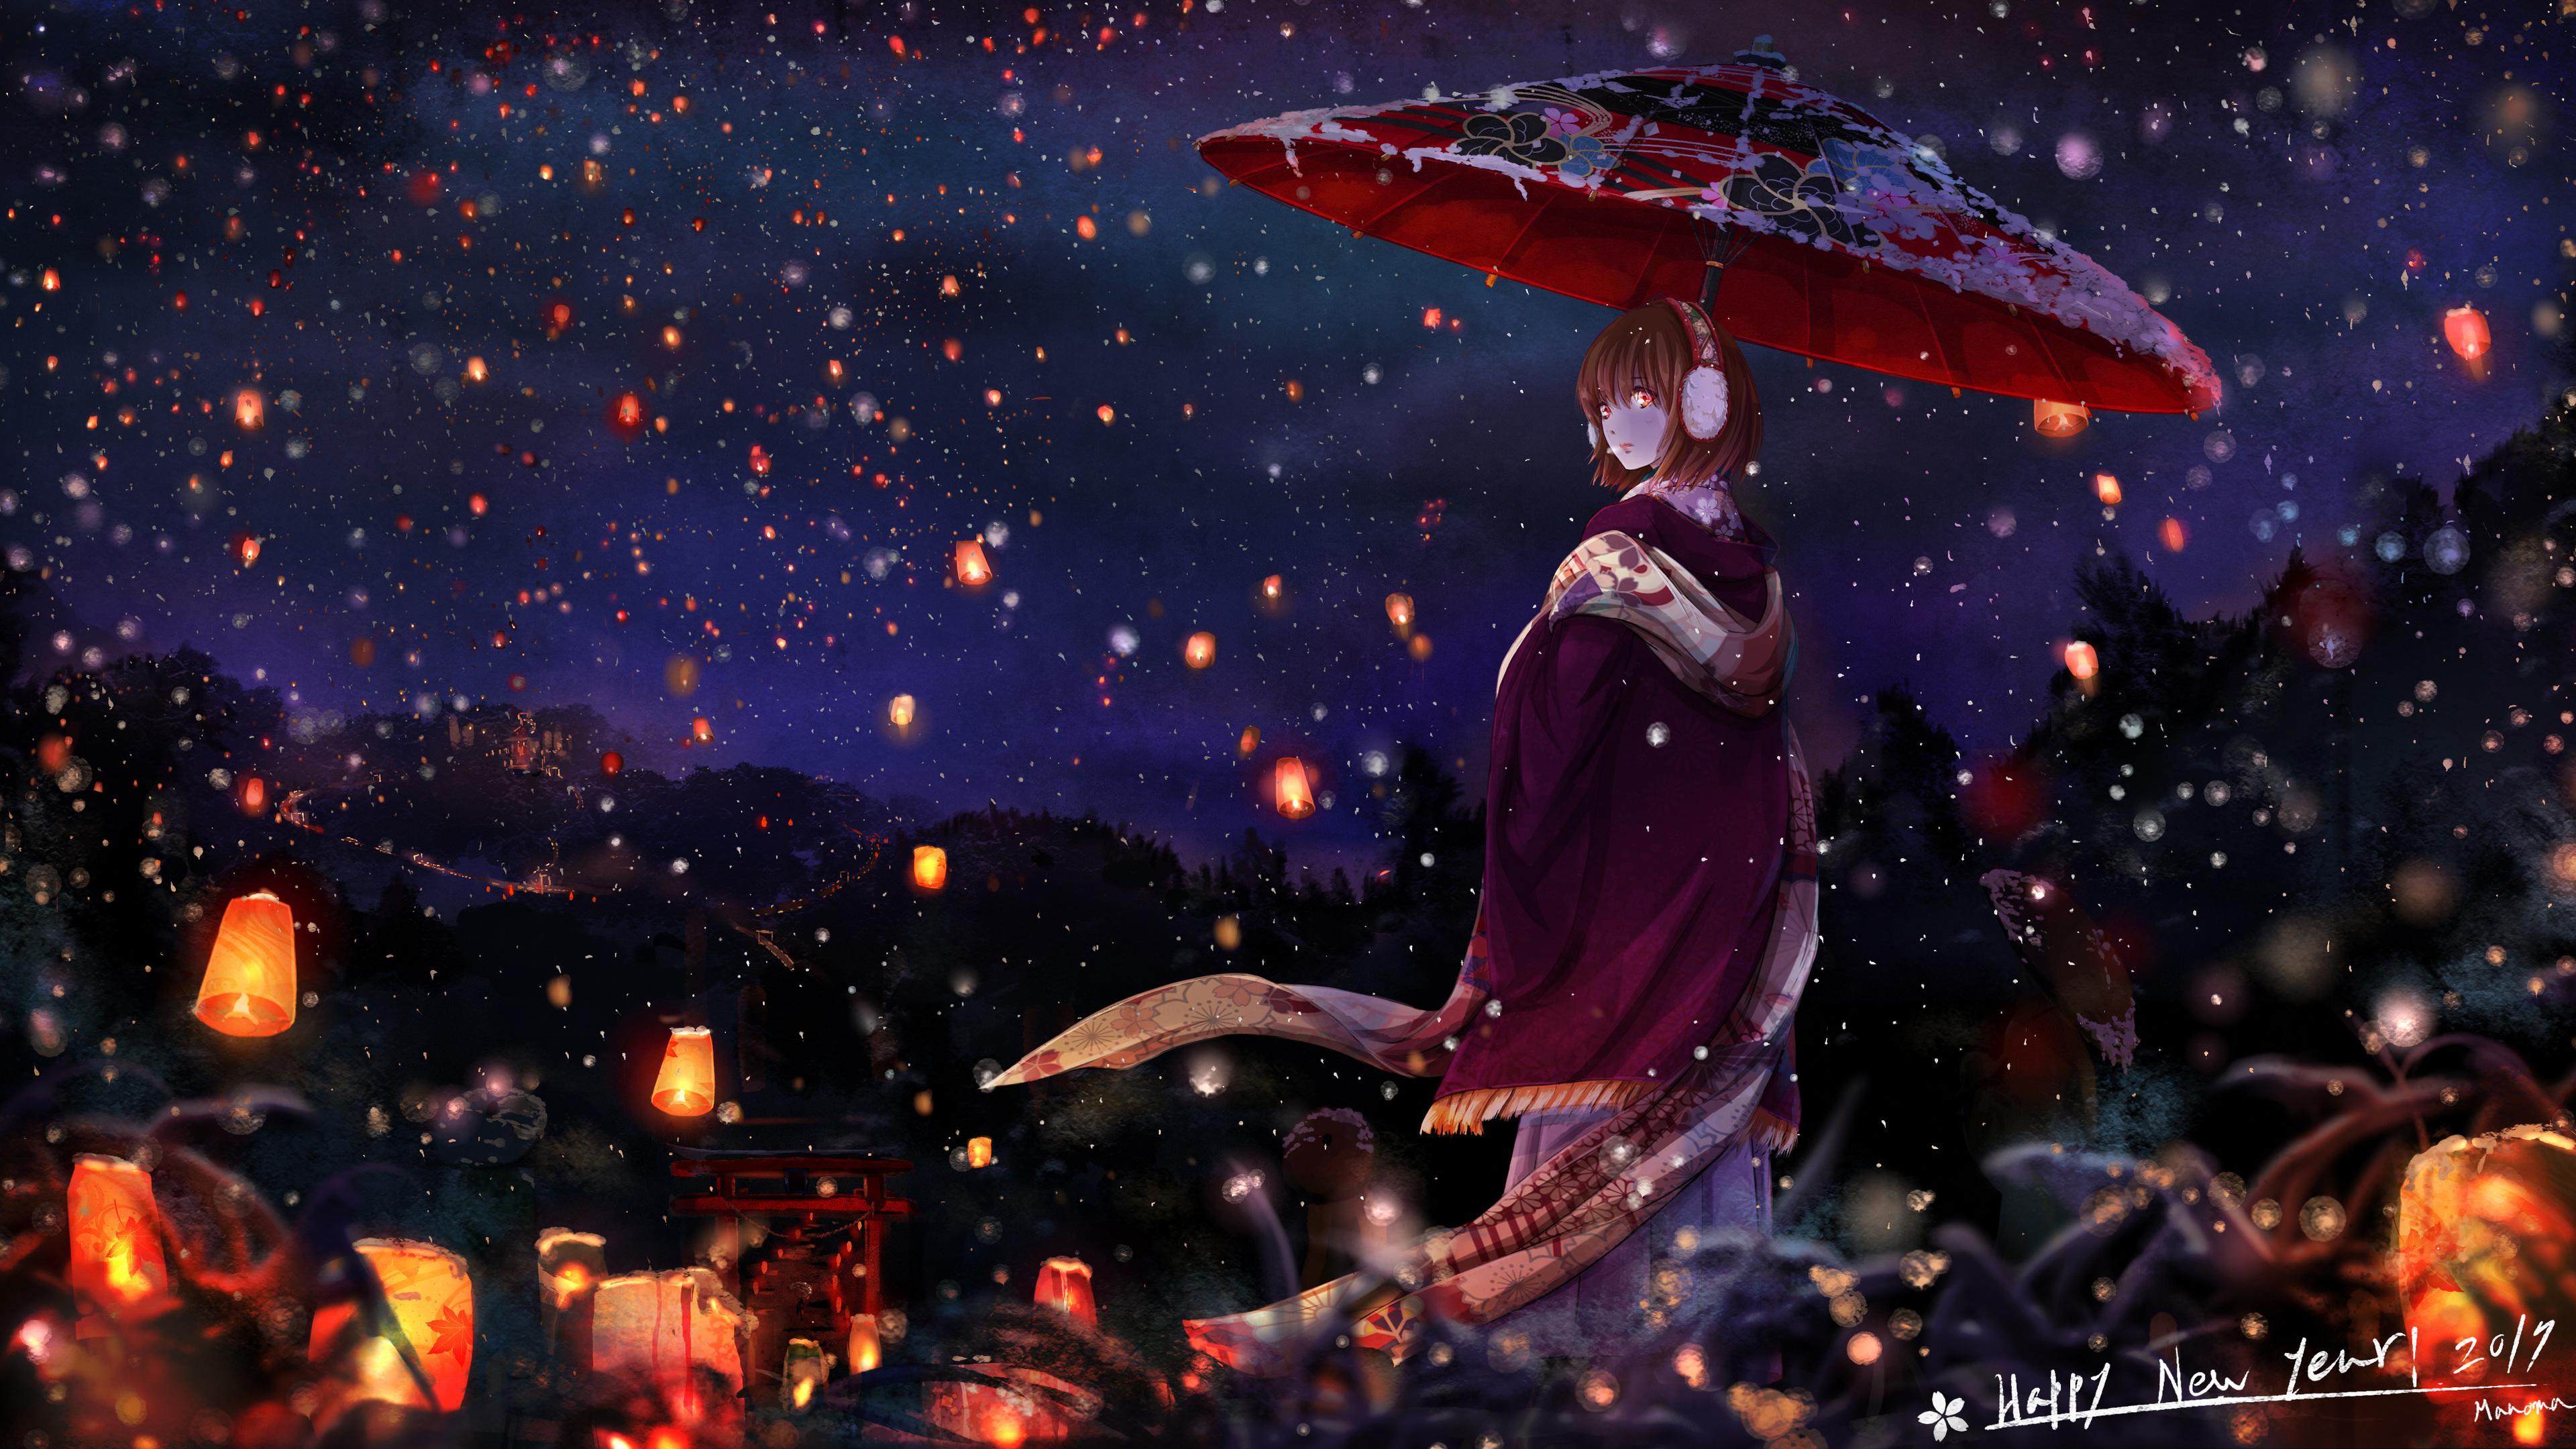 anime girl with umbrella 1541974155 - Anime Girl With Umbrella - umbrella wallpapers, hd-wallpapers, digital art wallpapers, artwork wallpapers, artist wallpapers, anime wallpapers, anime girl wallpapers, 4k-wallpapers